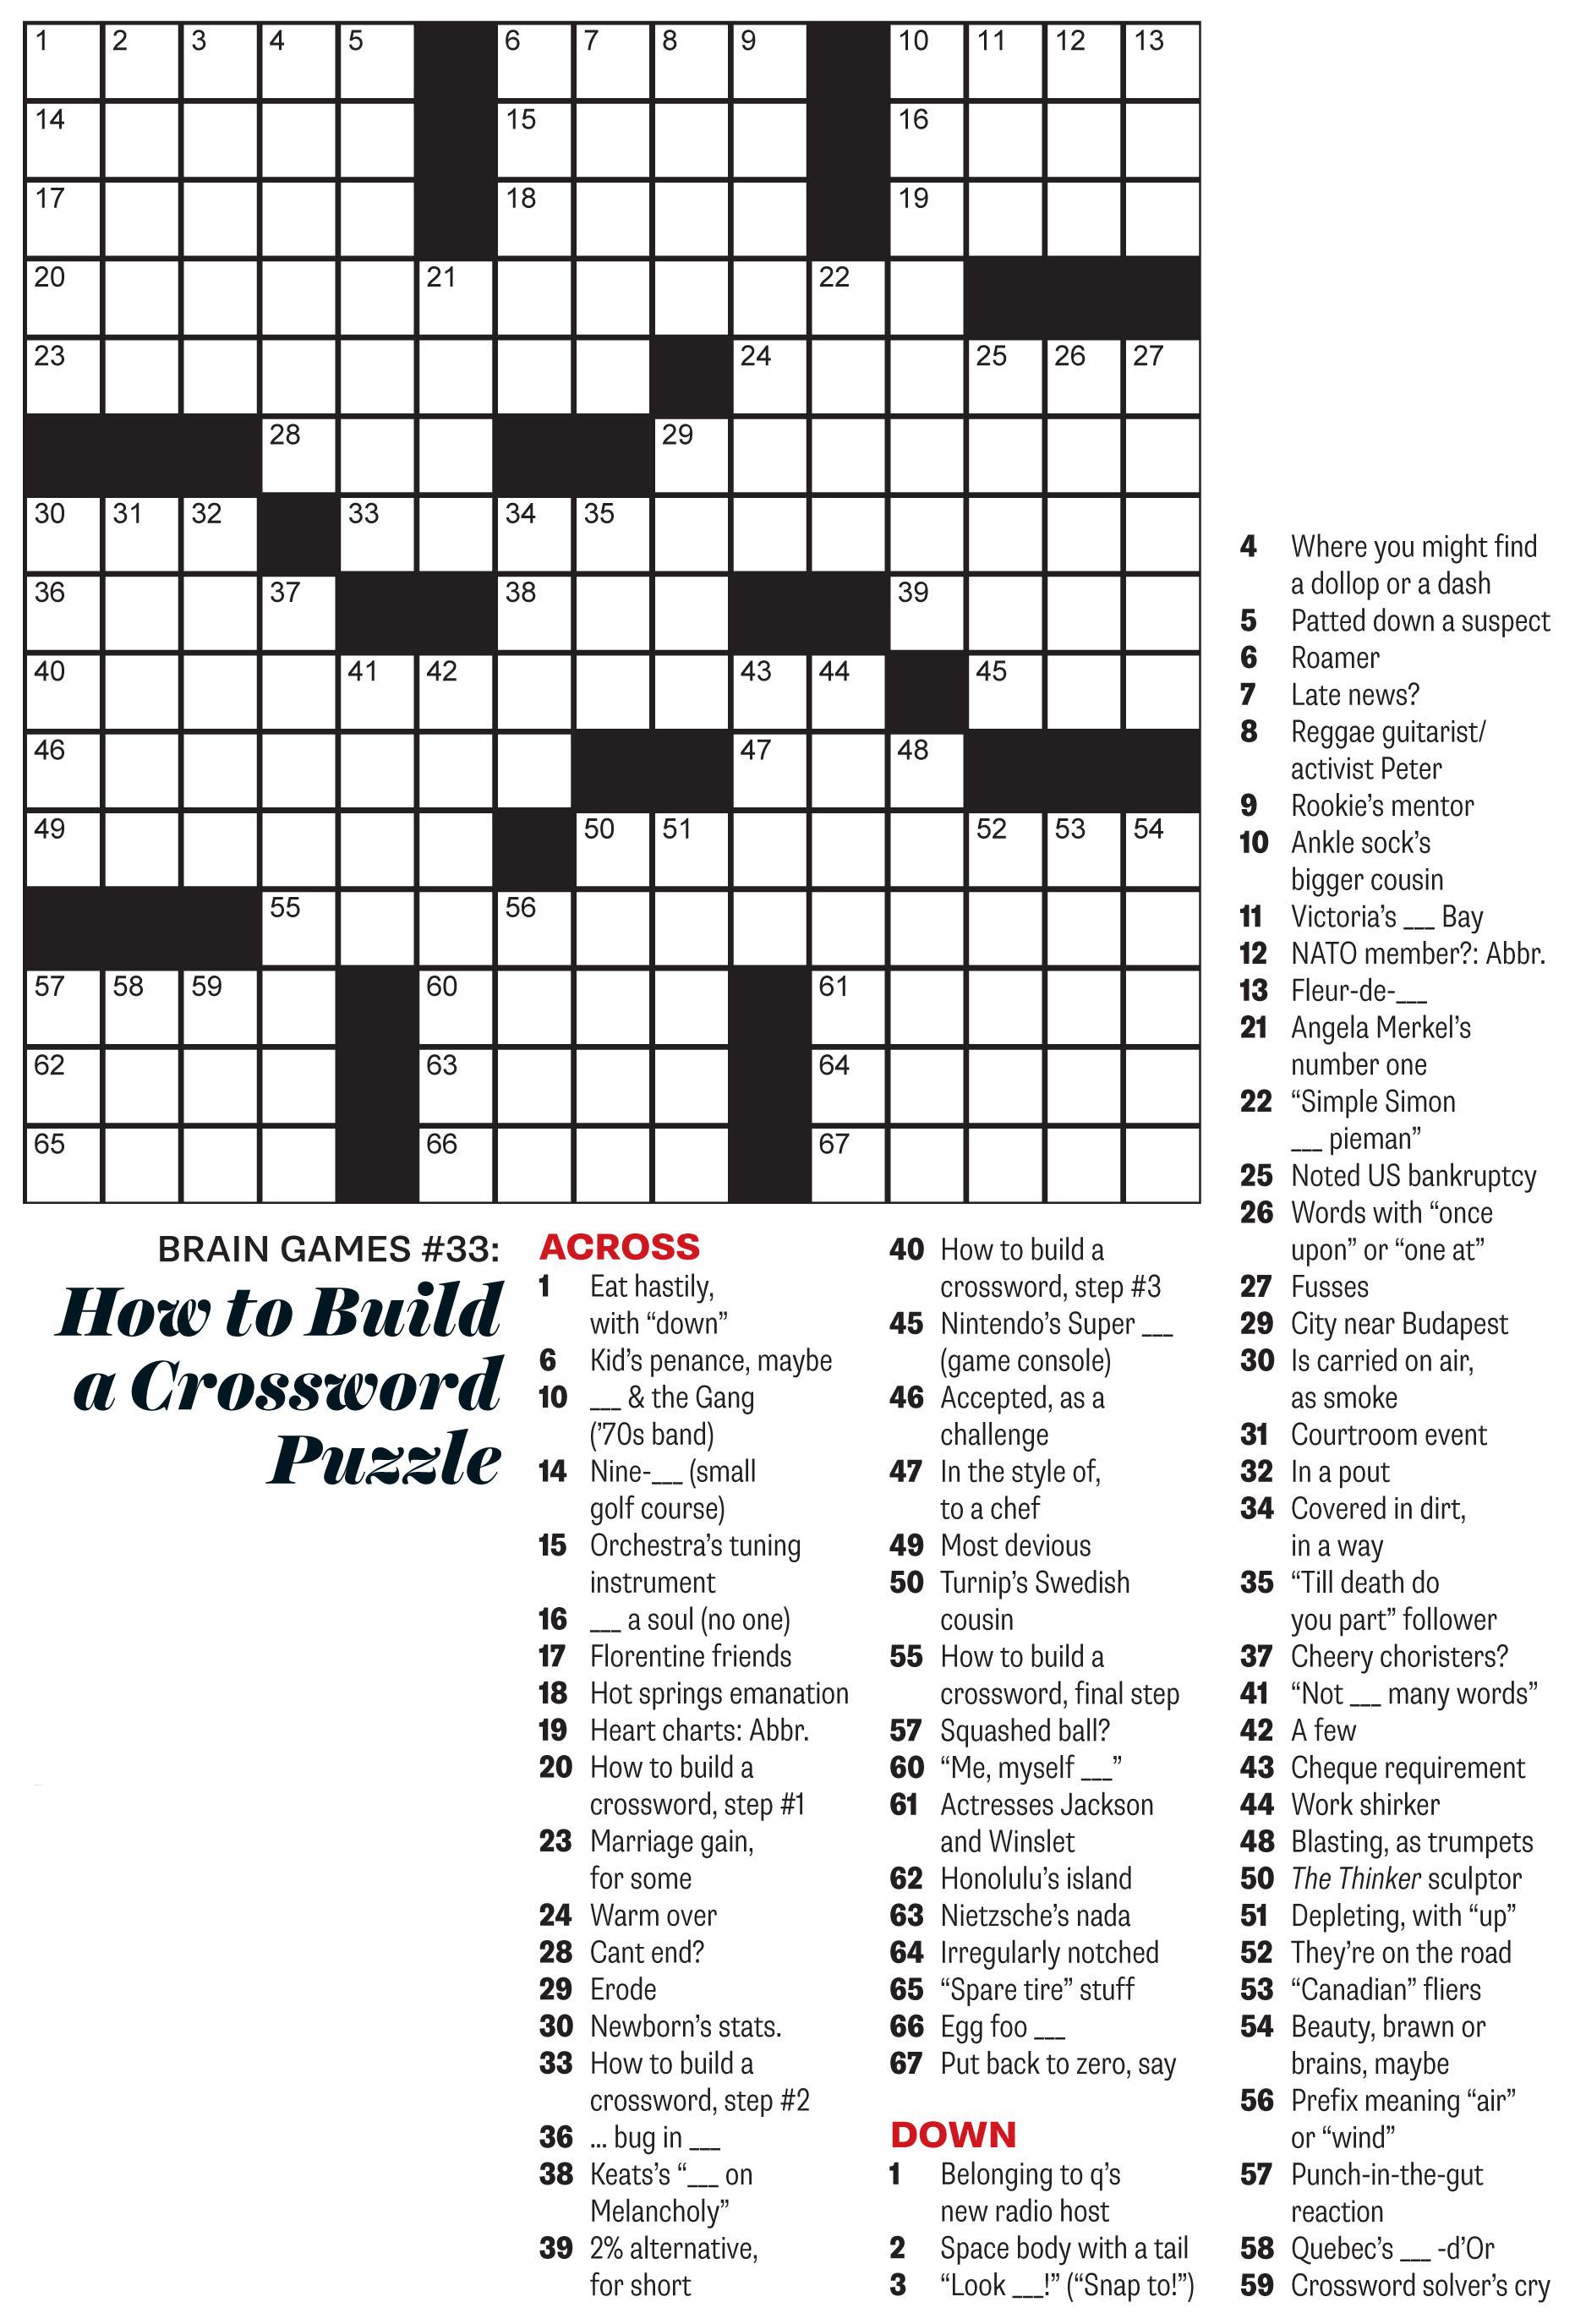 October 2015 Crossword: How to Build a Crossword Puzzle